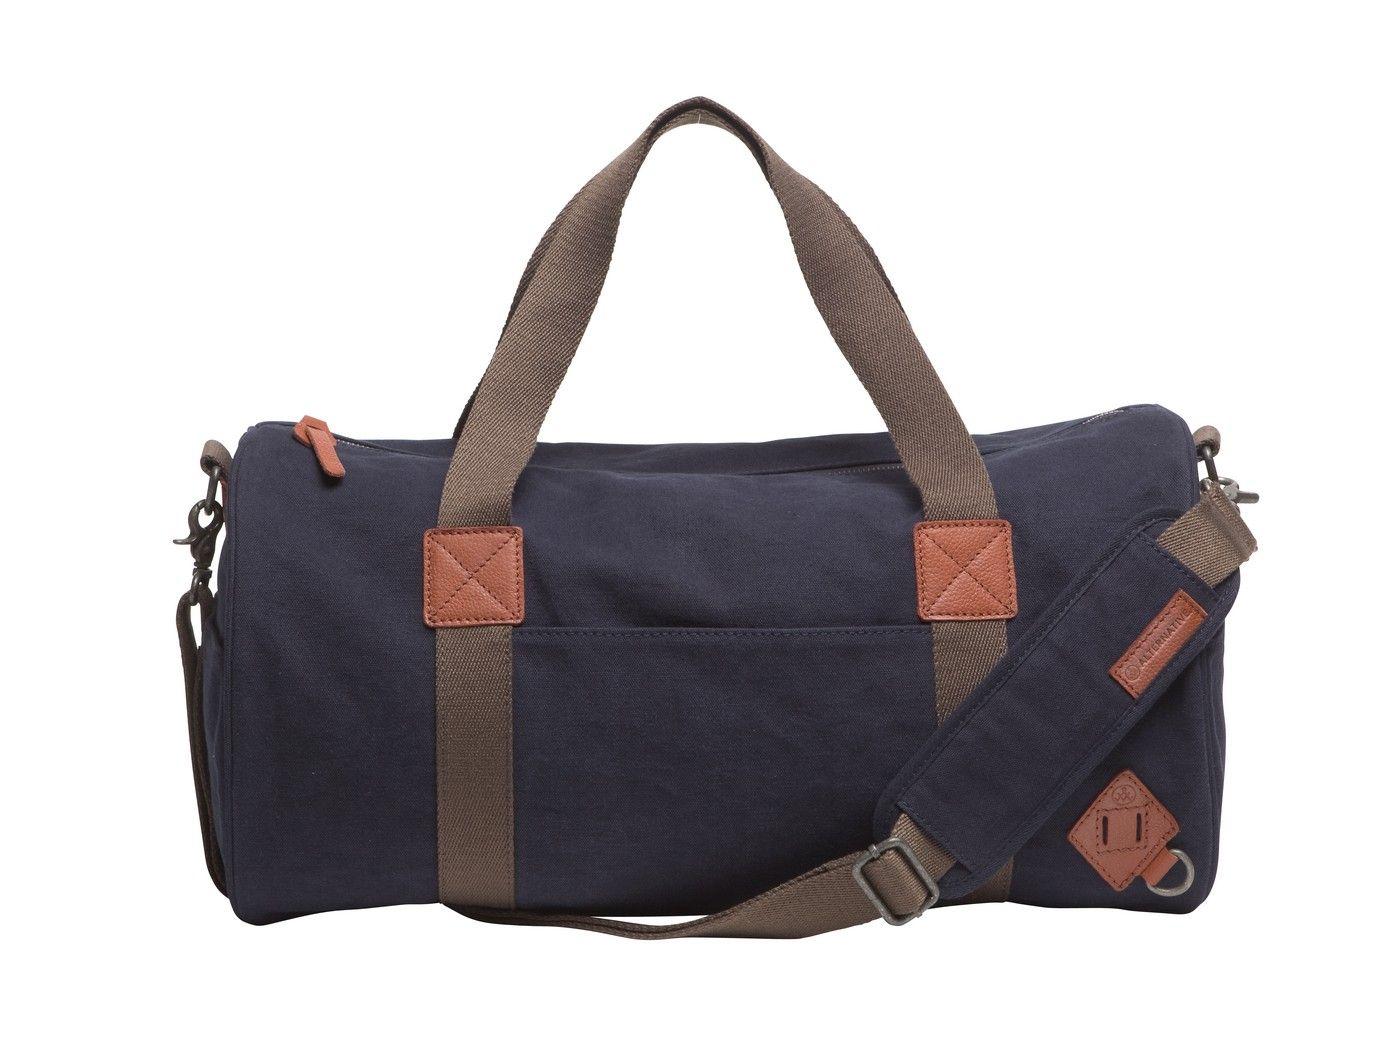 b7d22763455f Basic Cotton Barrel Duffel Bag in 2019 | bags | Duffel bag, Bags ...